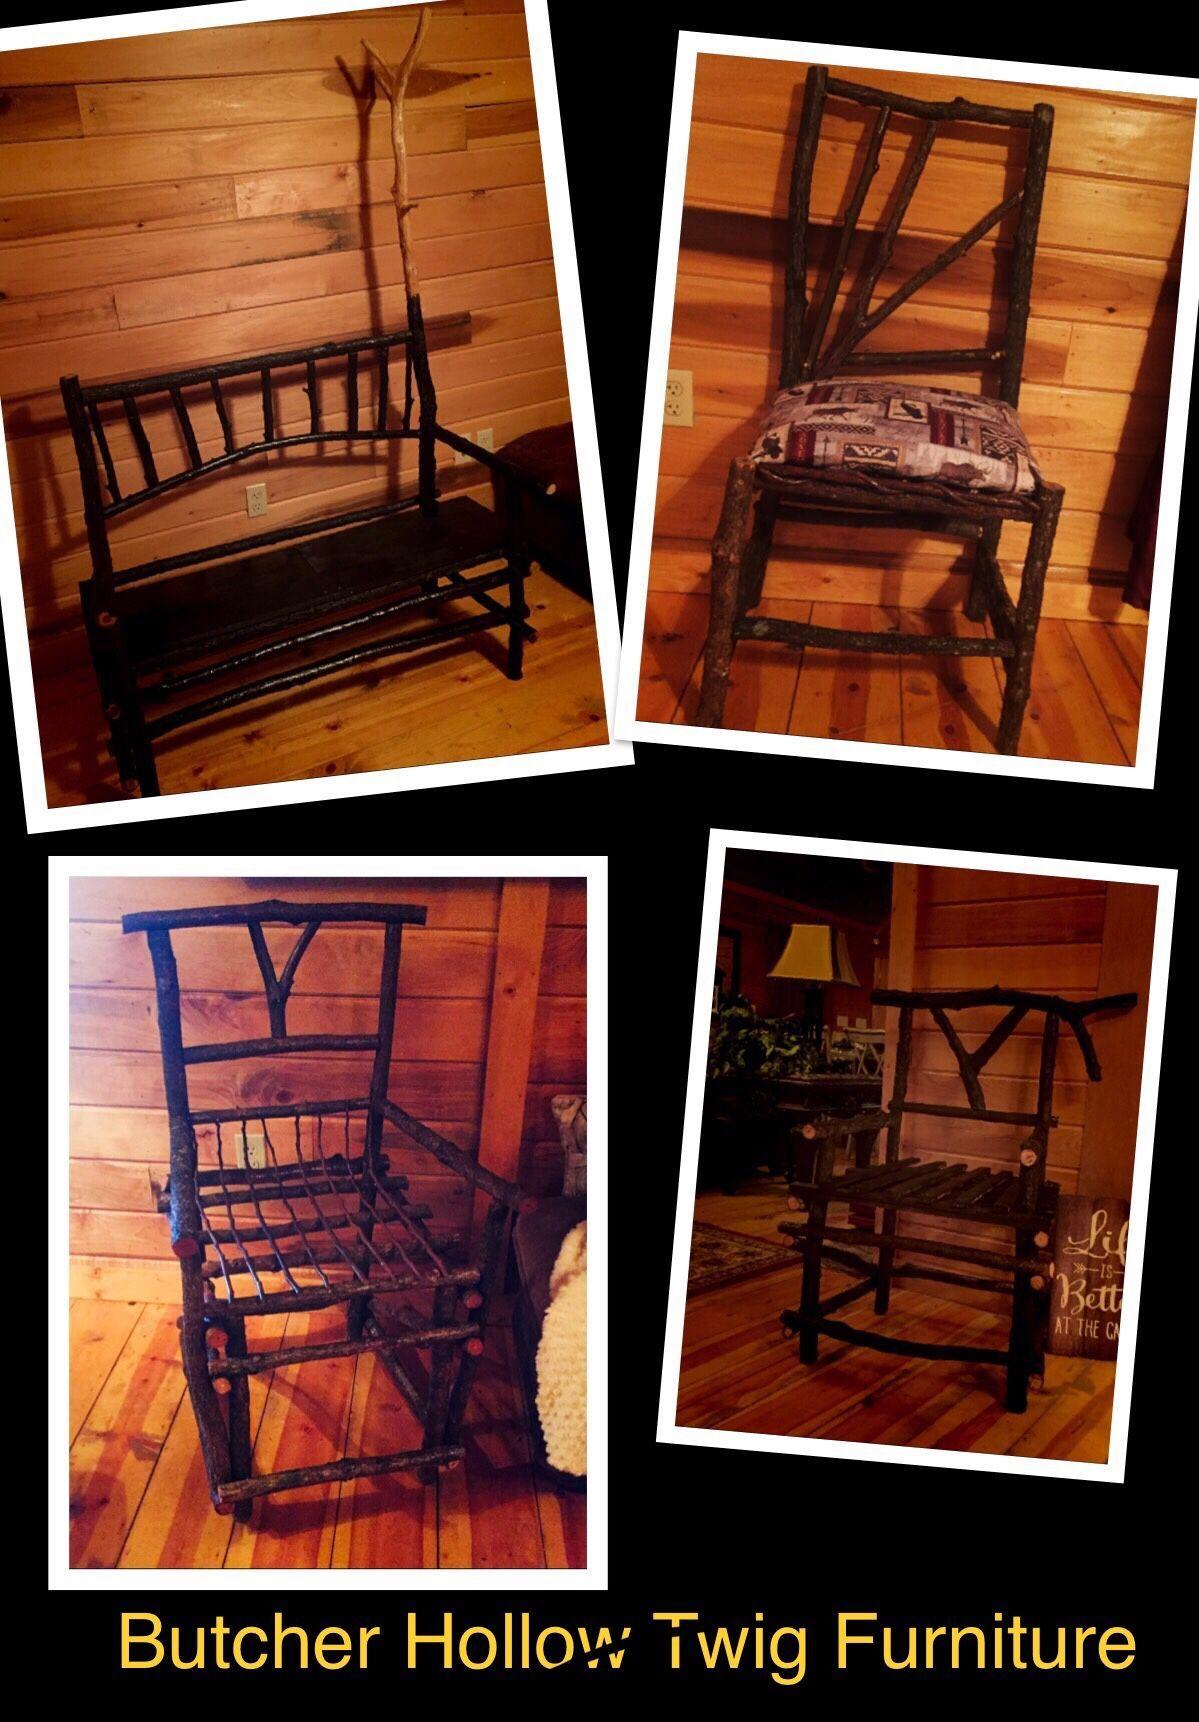 Twig Furniture  #twigfurniture Appalachian Twig furniture designed by Kentucky Coal Surveyor Jim Jack Penix #twigfurniture